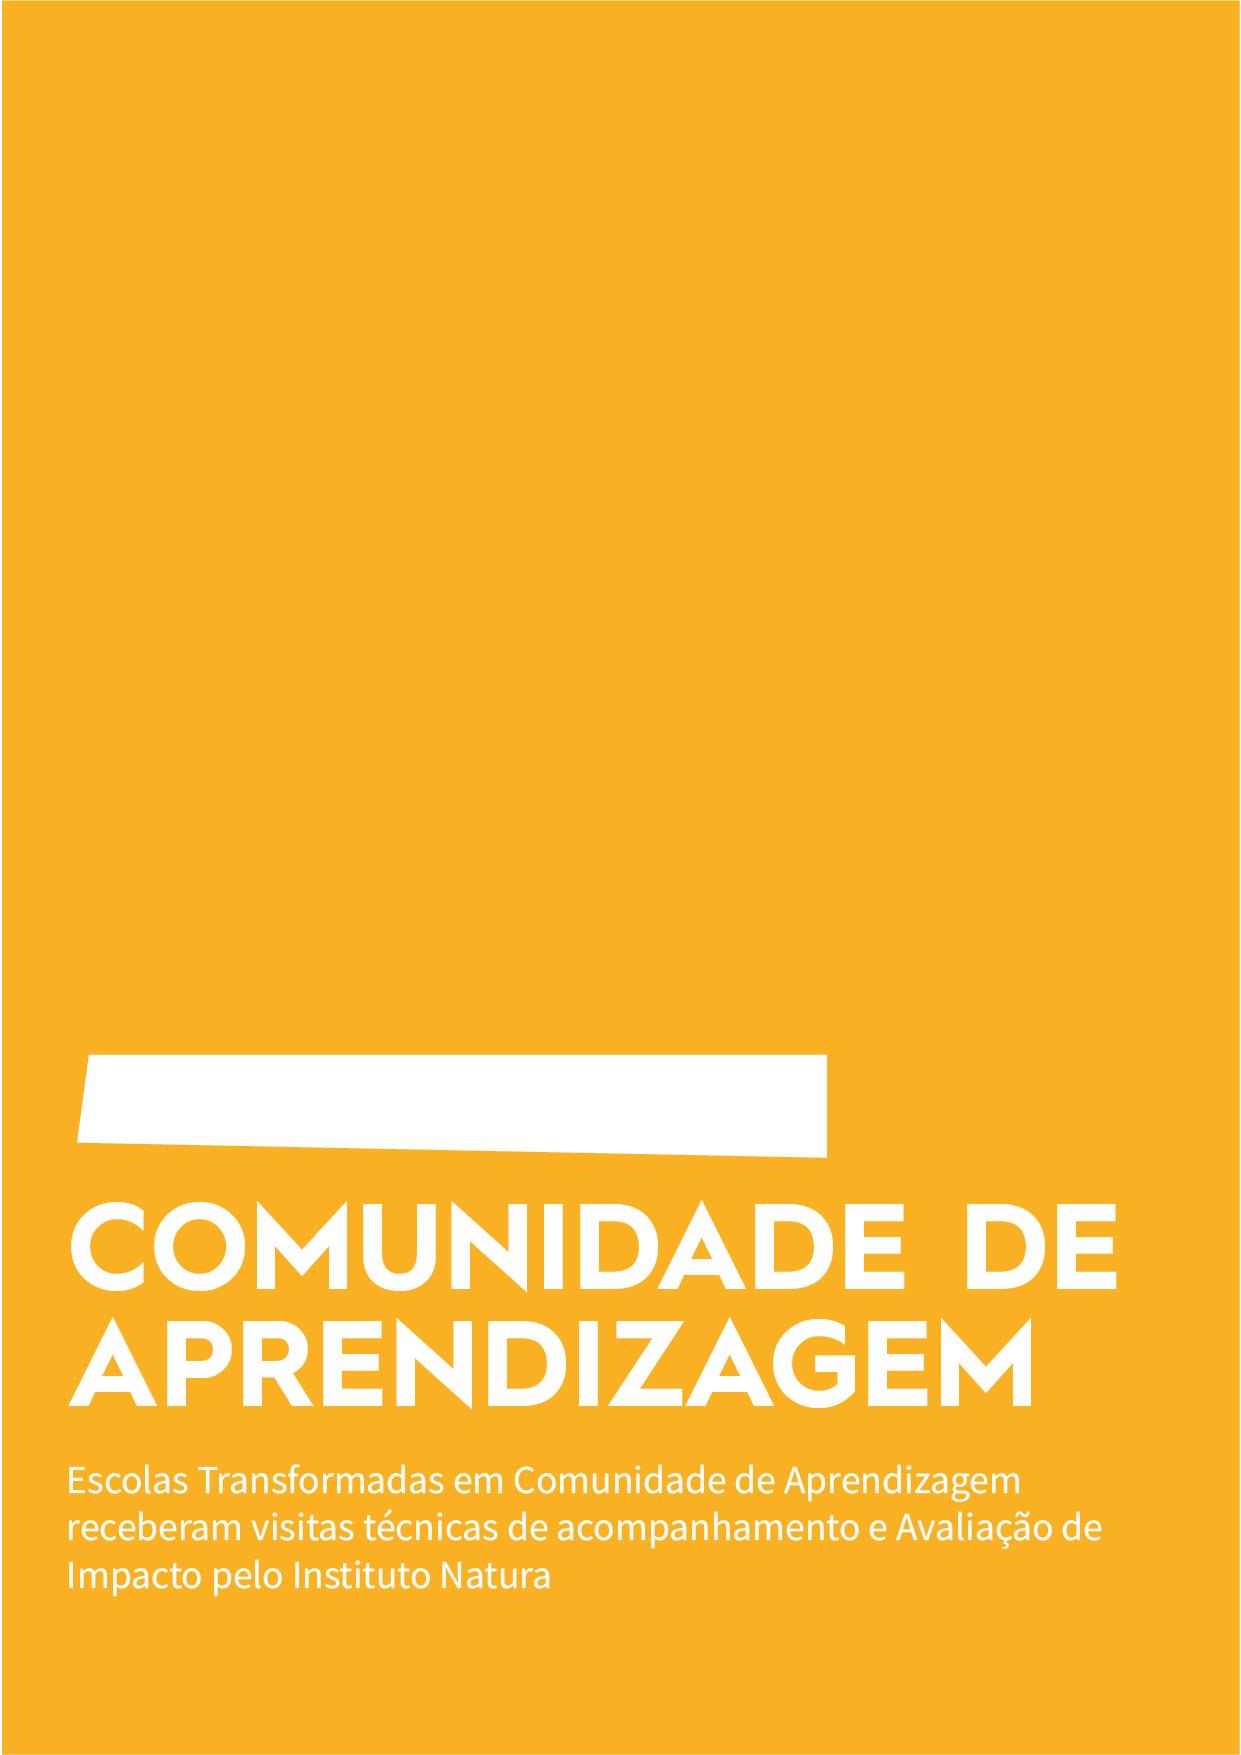 ICEP - Boletim edição 2, versão impressa_Fundo copy 7